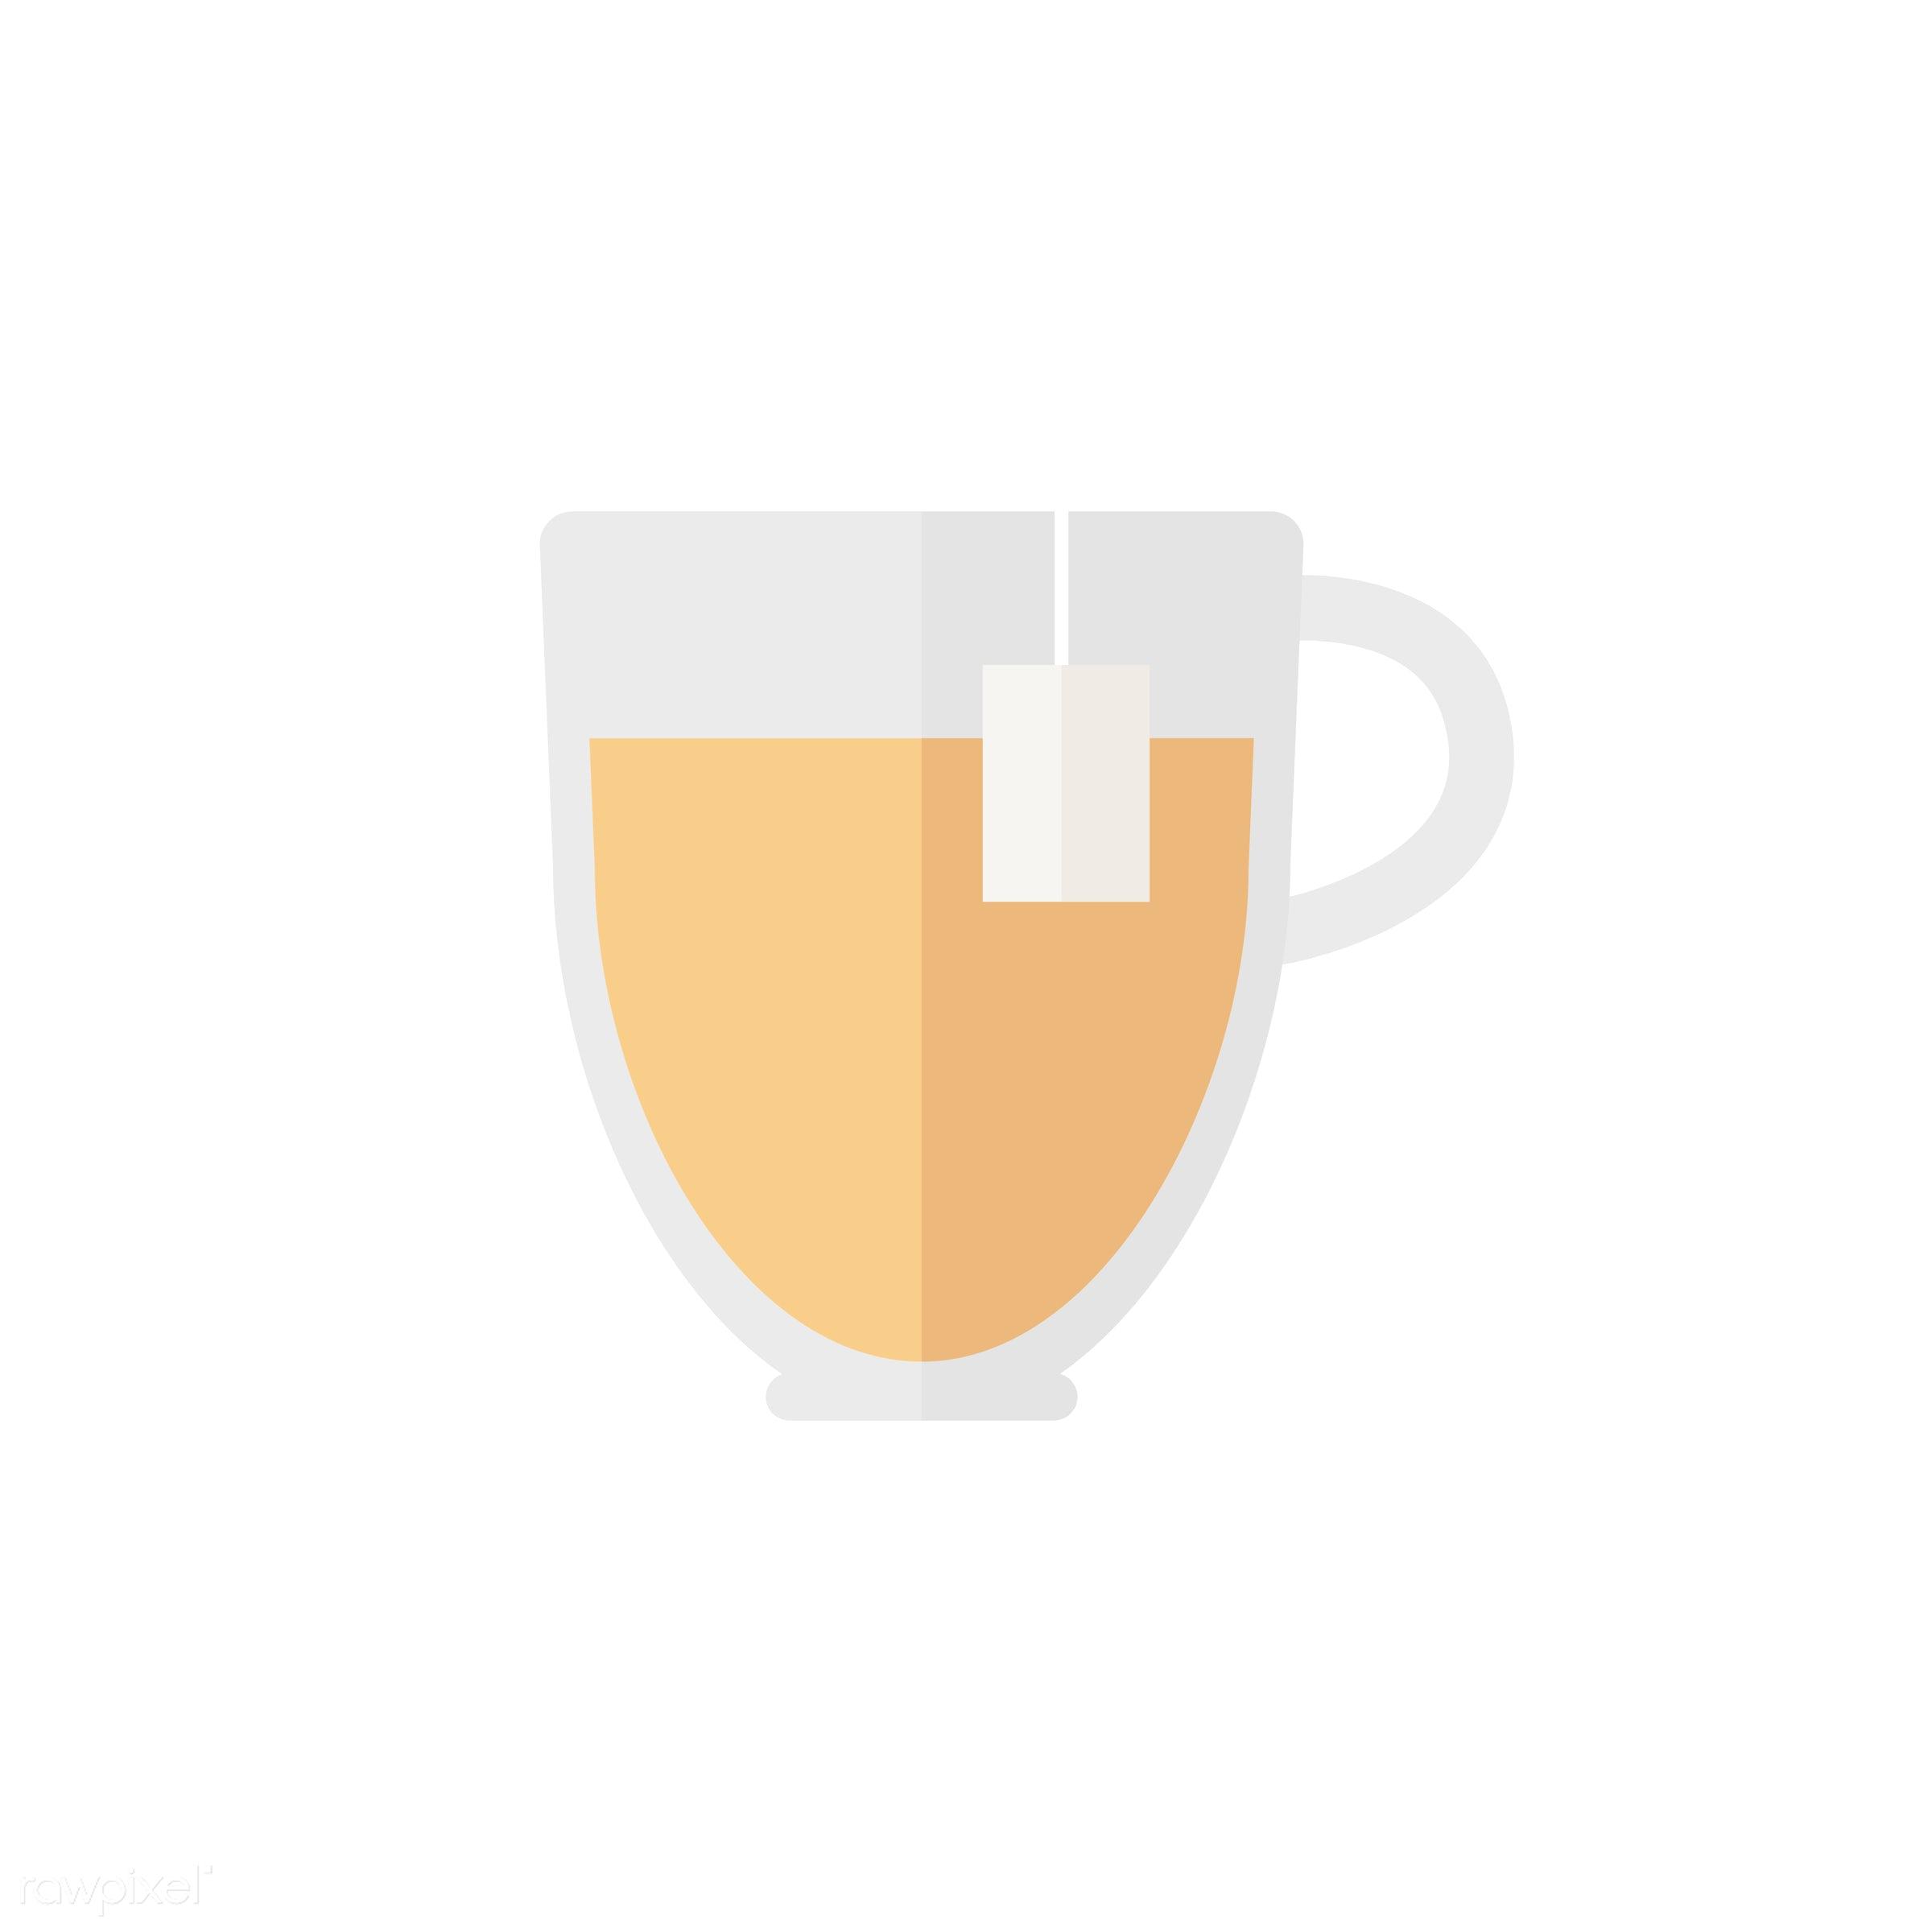 vector, graphic, illustration, icon, symbol, colorful, cute, mug, tea, tea cup, hot drink, drink, beverage, water